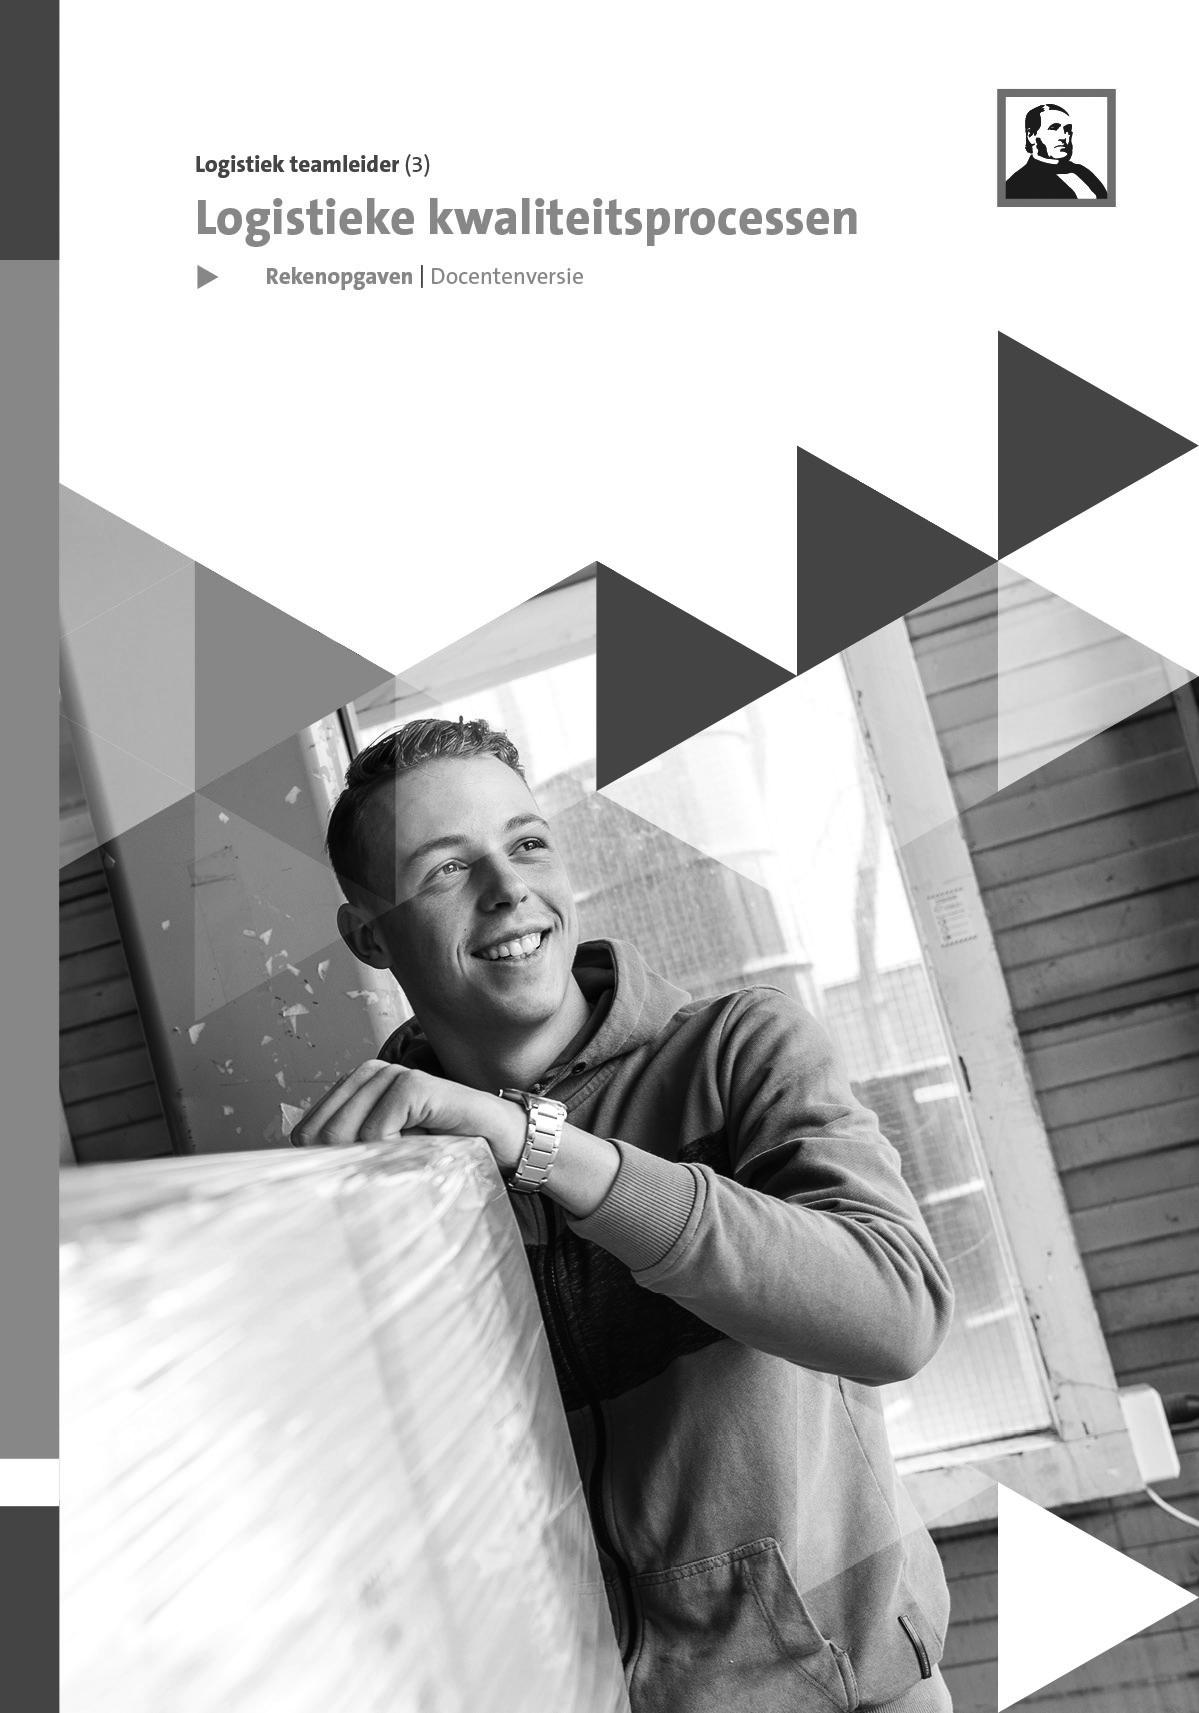 Afbeelding van Extra rekenopgaven Logistieke kwaliteitsprocessen (Logistiek N3)